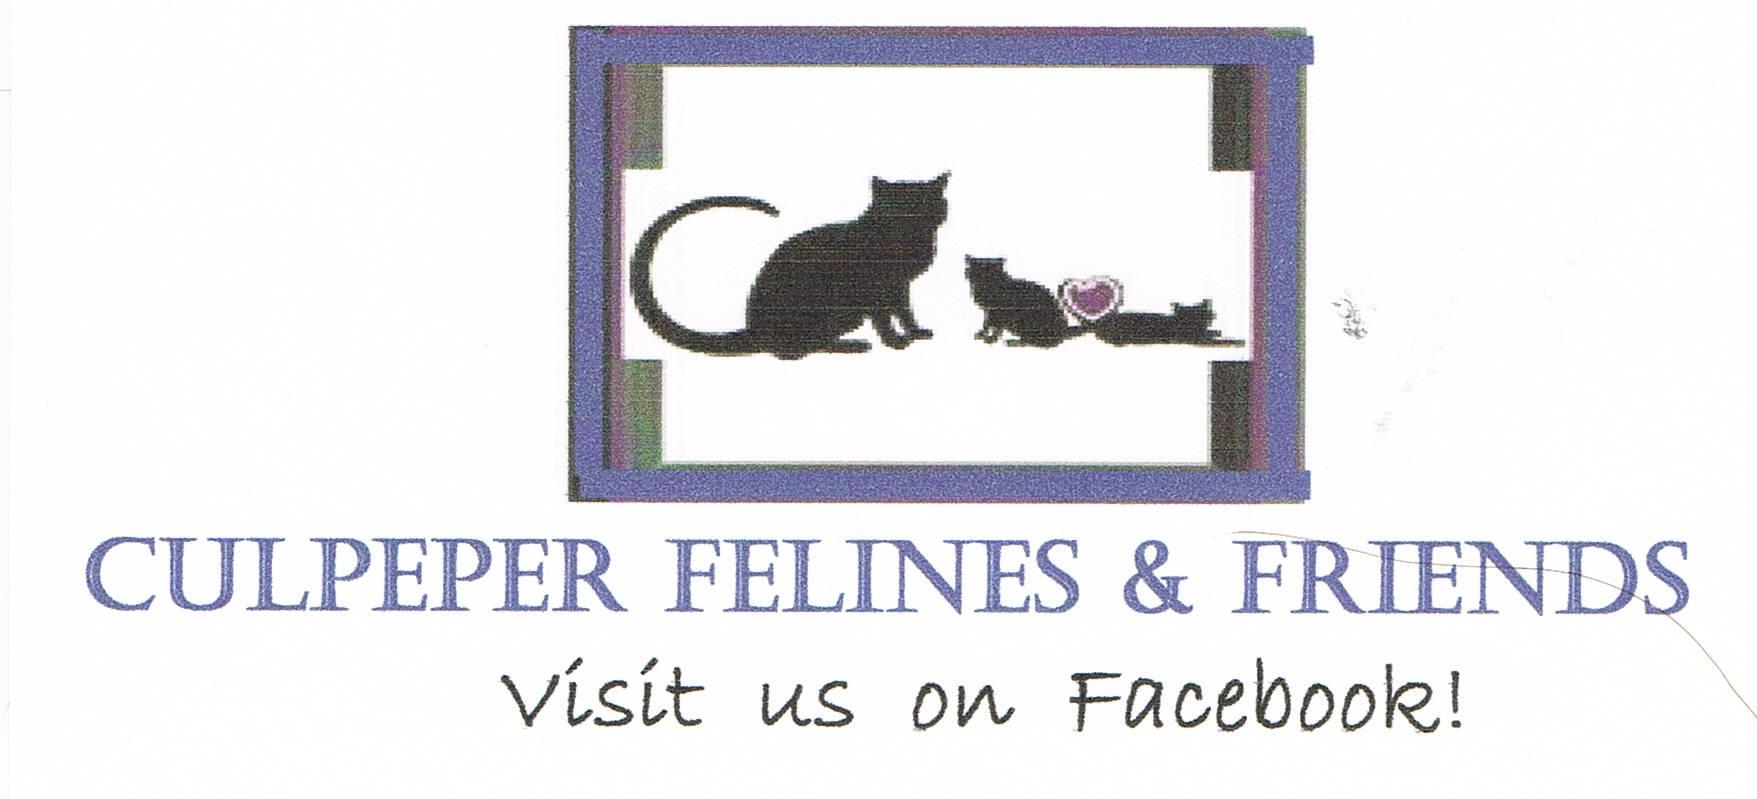 Culpeper Felines & Friends